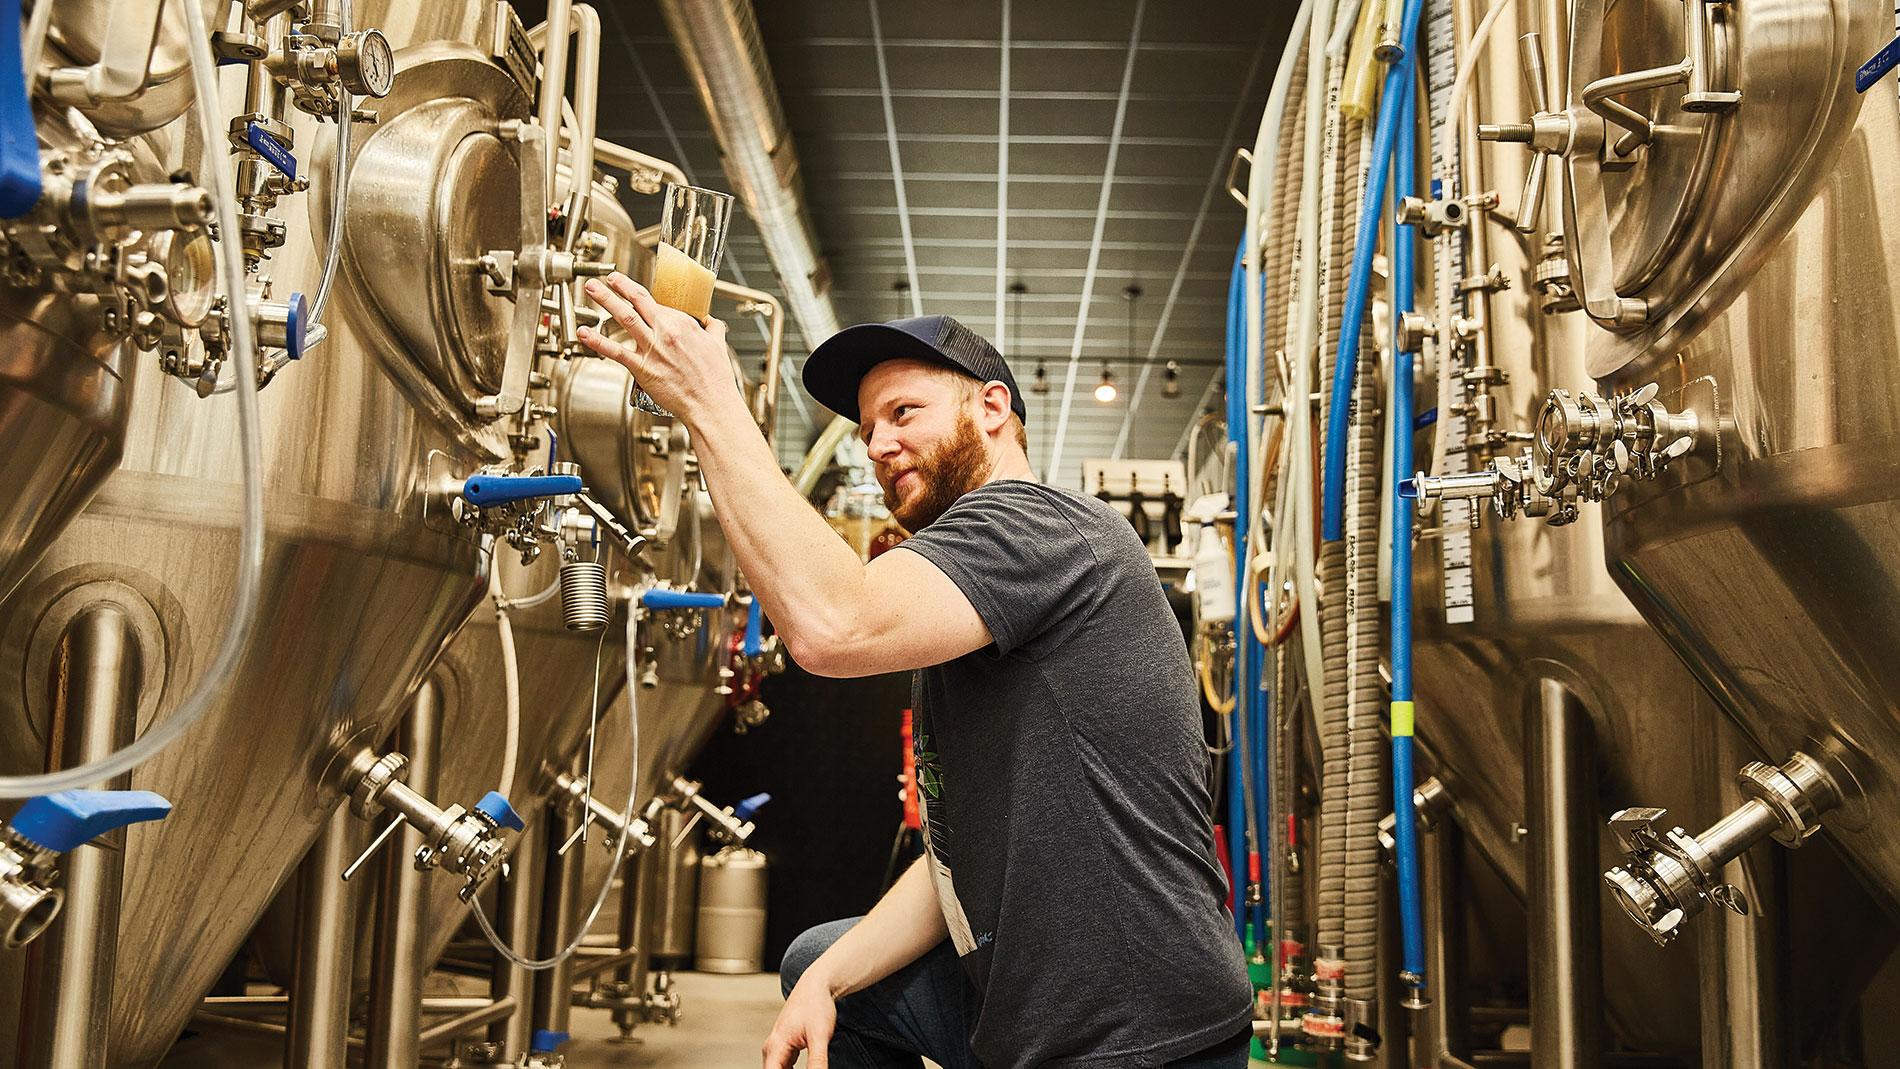 kyle kohlmorgen, head brewer at wellspent brewing co. in st. louis